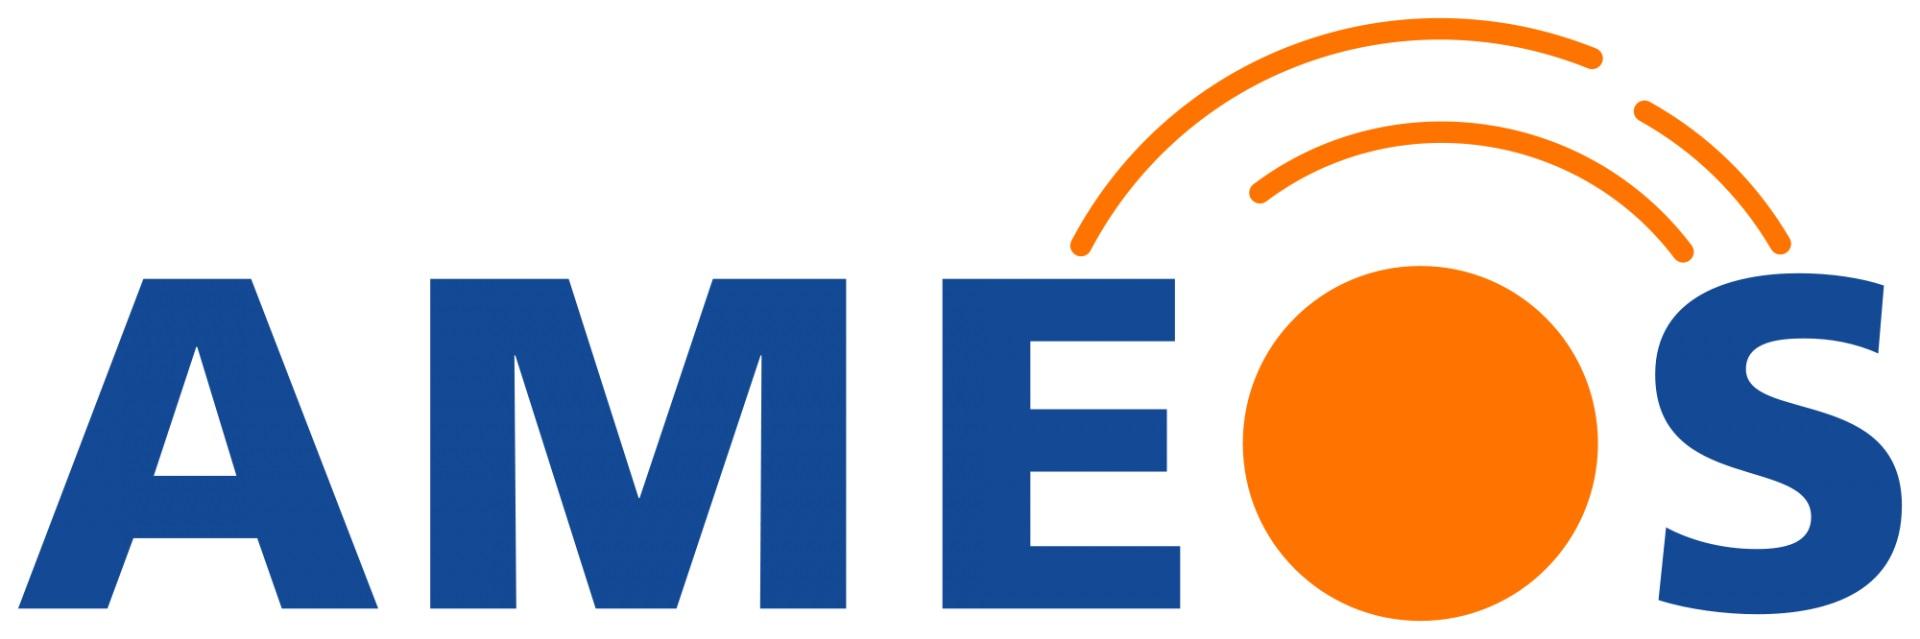 messedaten_messe_205_weblogos_ameos_krankenhausgesellschaft_nds_bremen_mbh.jpg